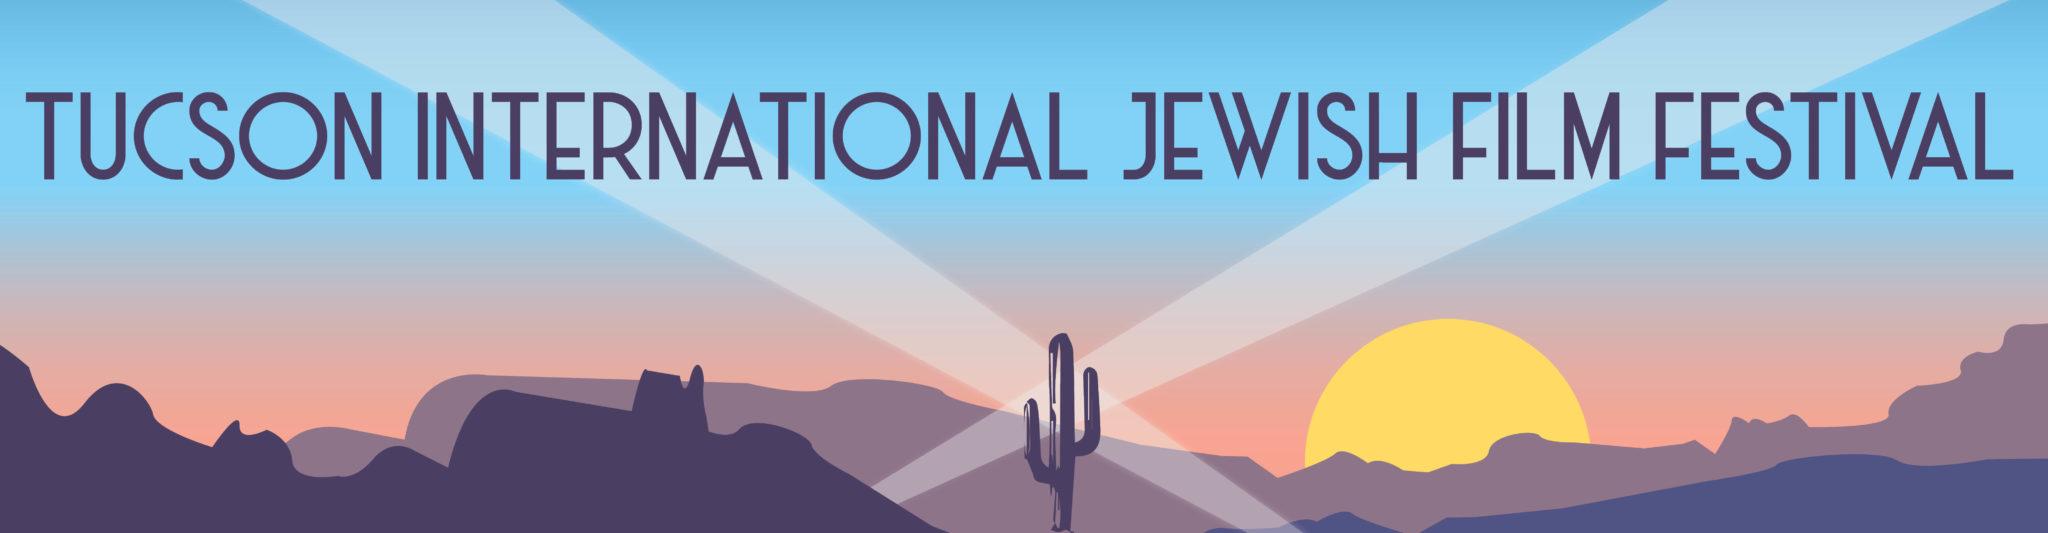 Tucson International Jewish Film Fest